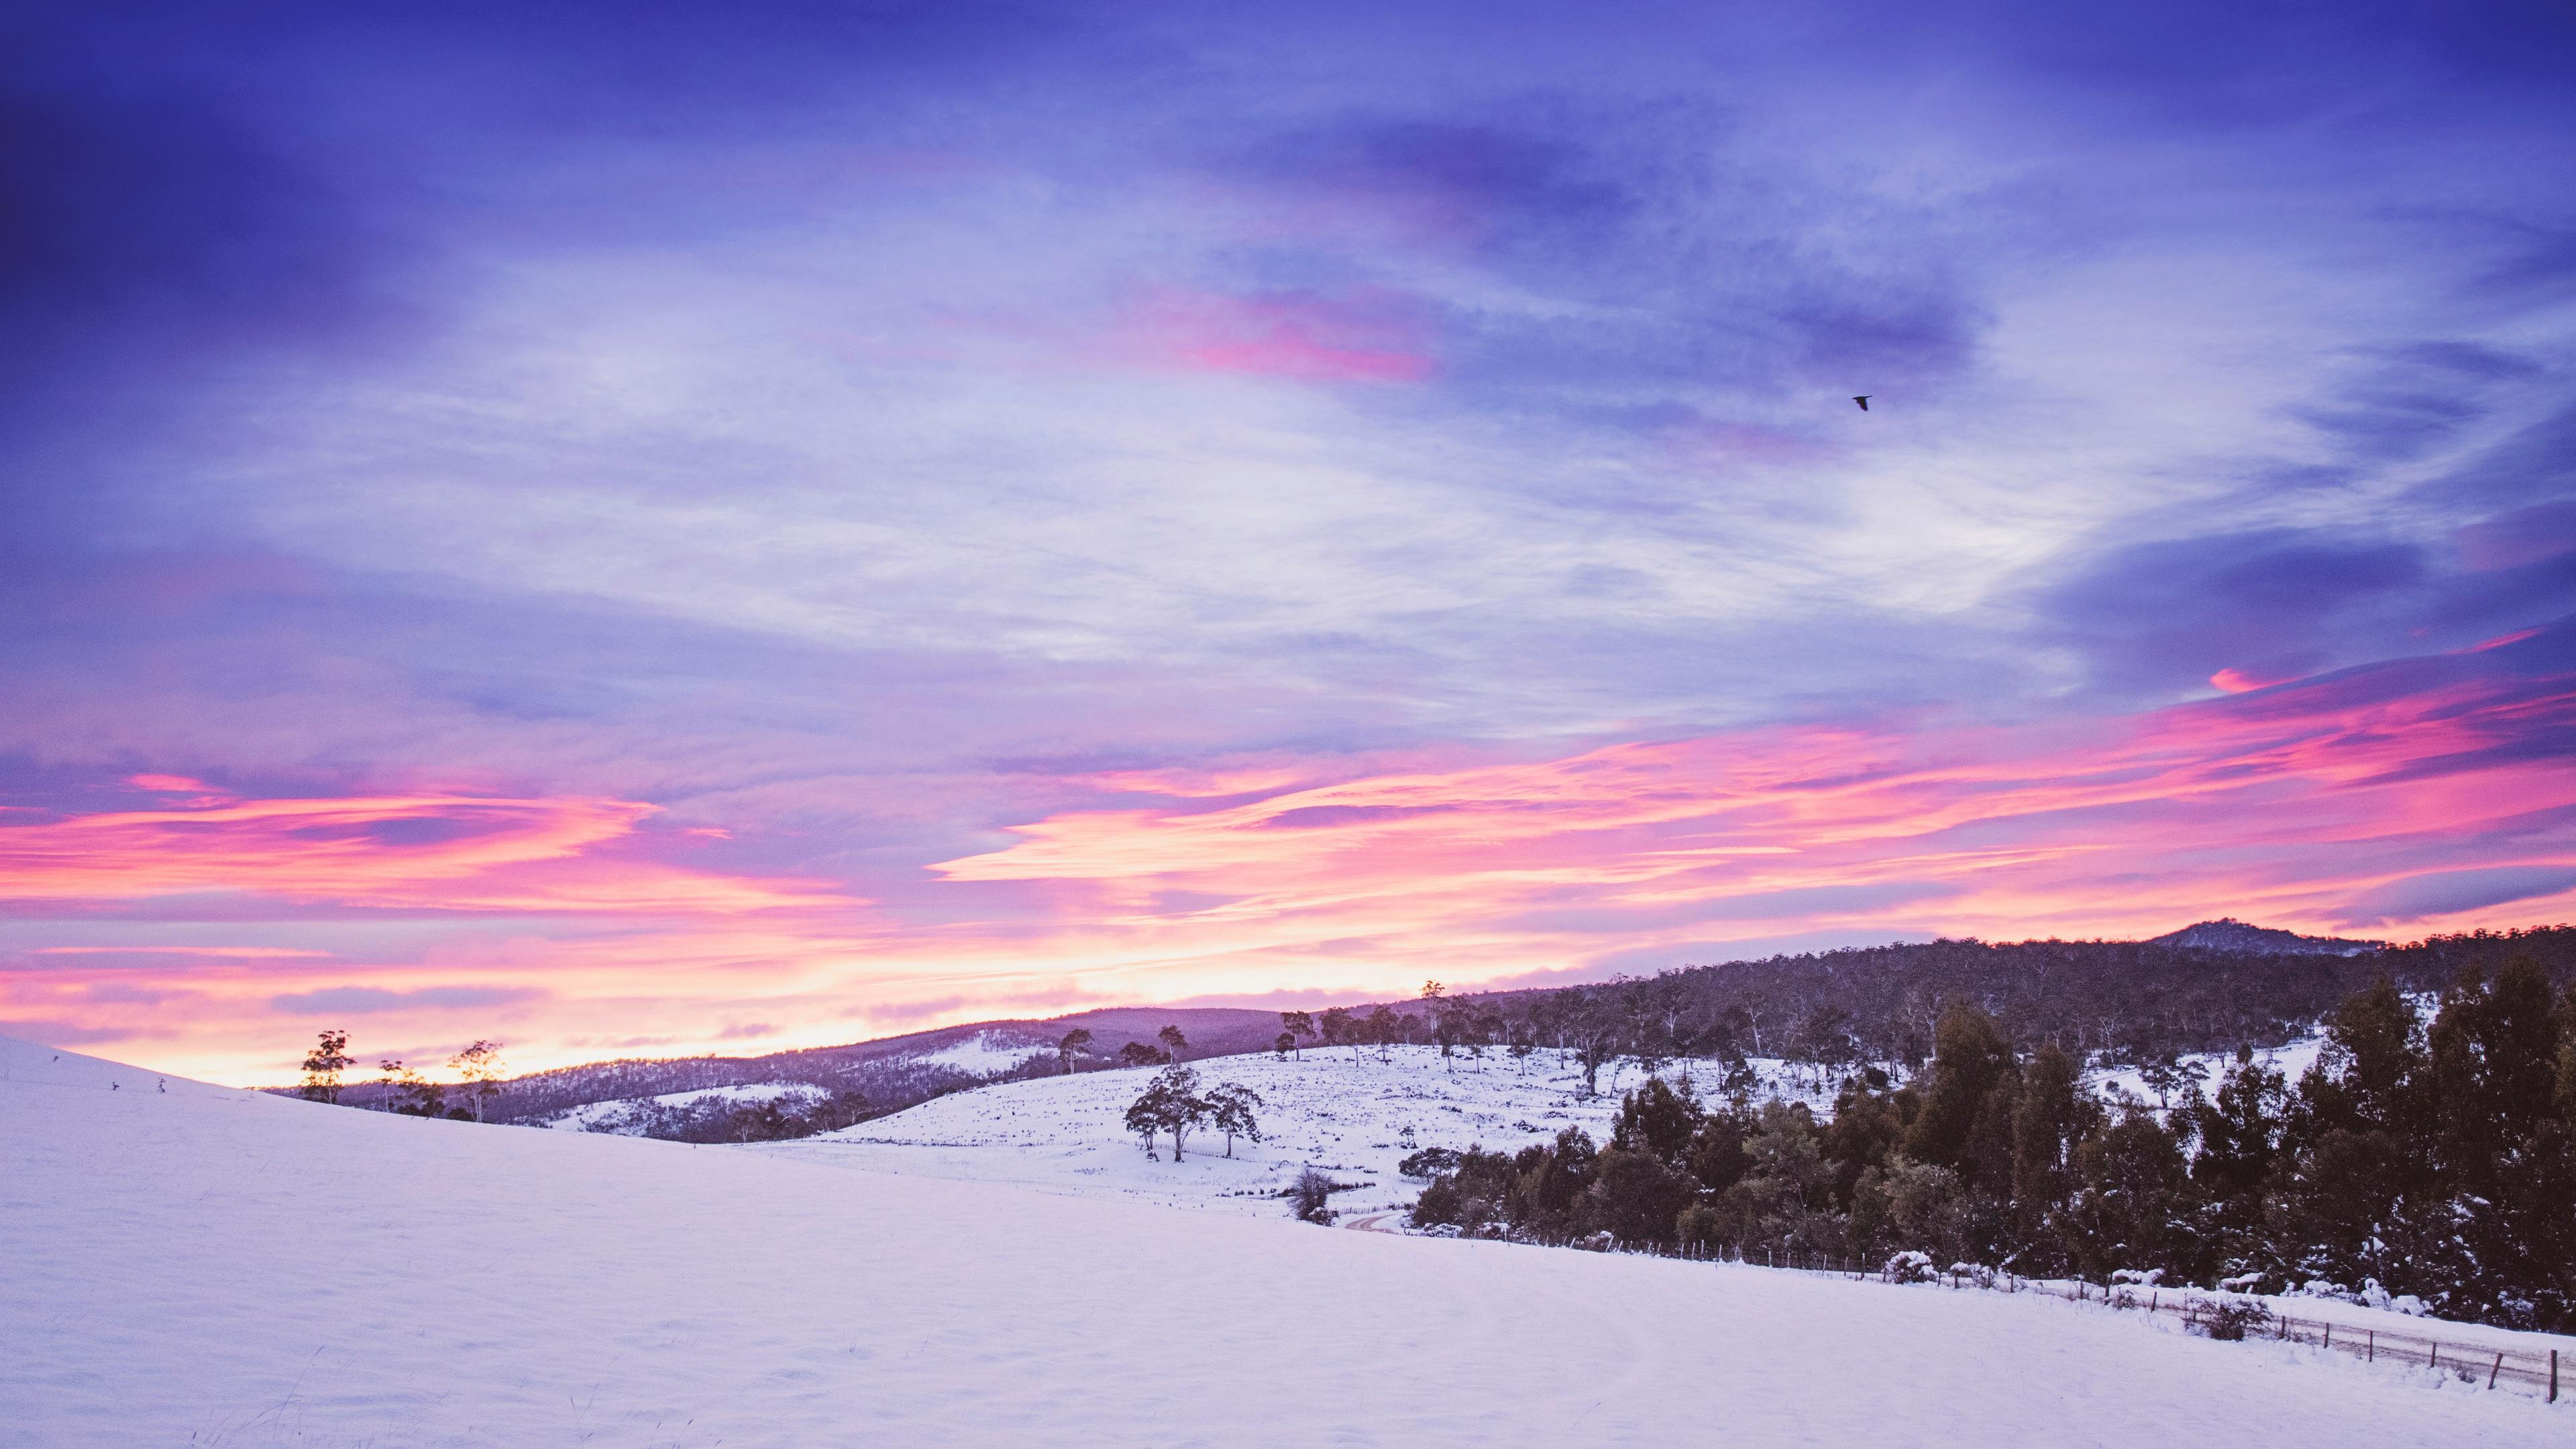 Wallpaper 4k Snowy Mountains Landscape 4k Wallpaper 3840x2160